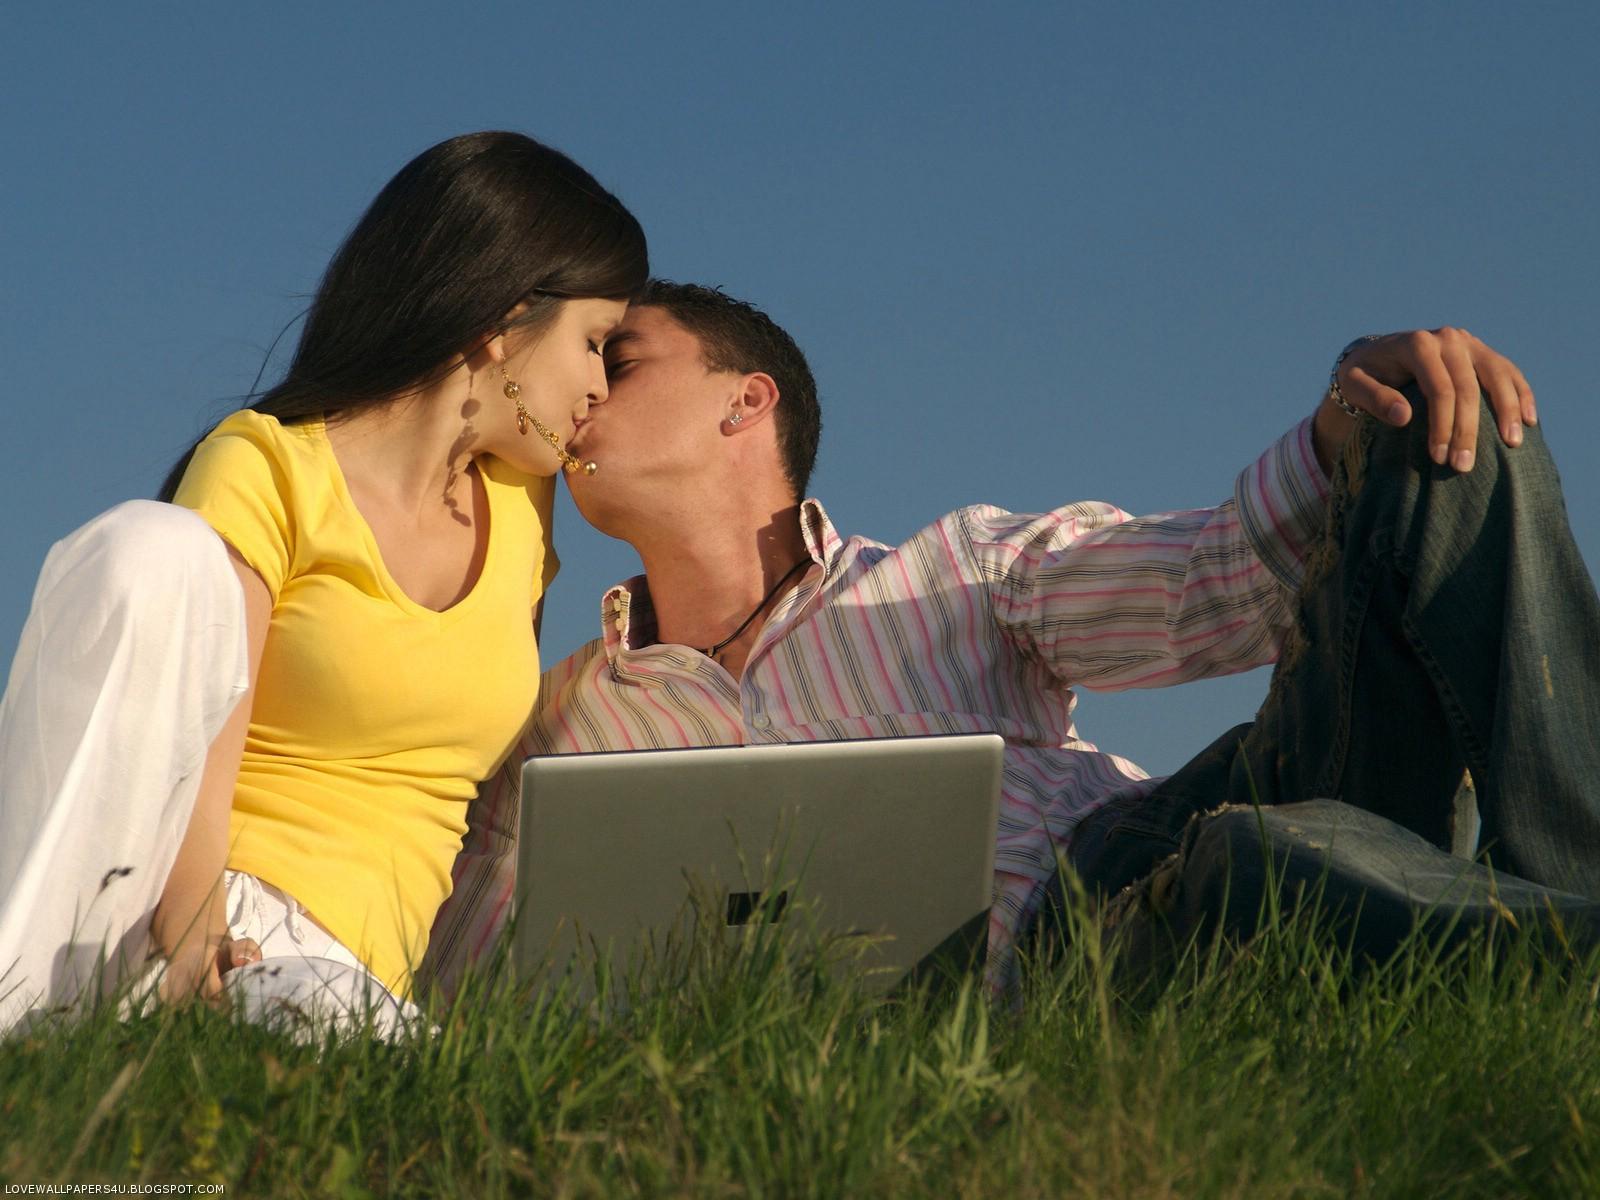 http://3.bp.blogspot.com/-QyN-3IhRfXs/T0sv4Nsk8rI/AAAAAAAADyM/alH1fFLpujs/s1600/kiss-of-love.jpg